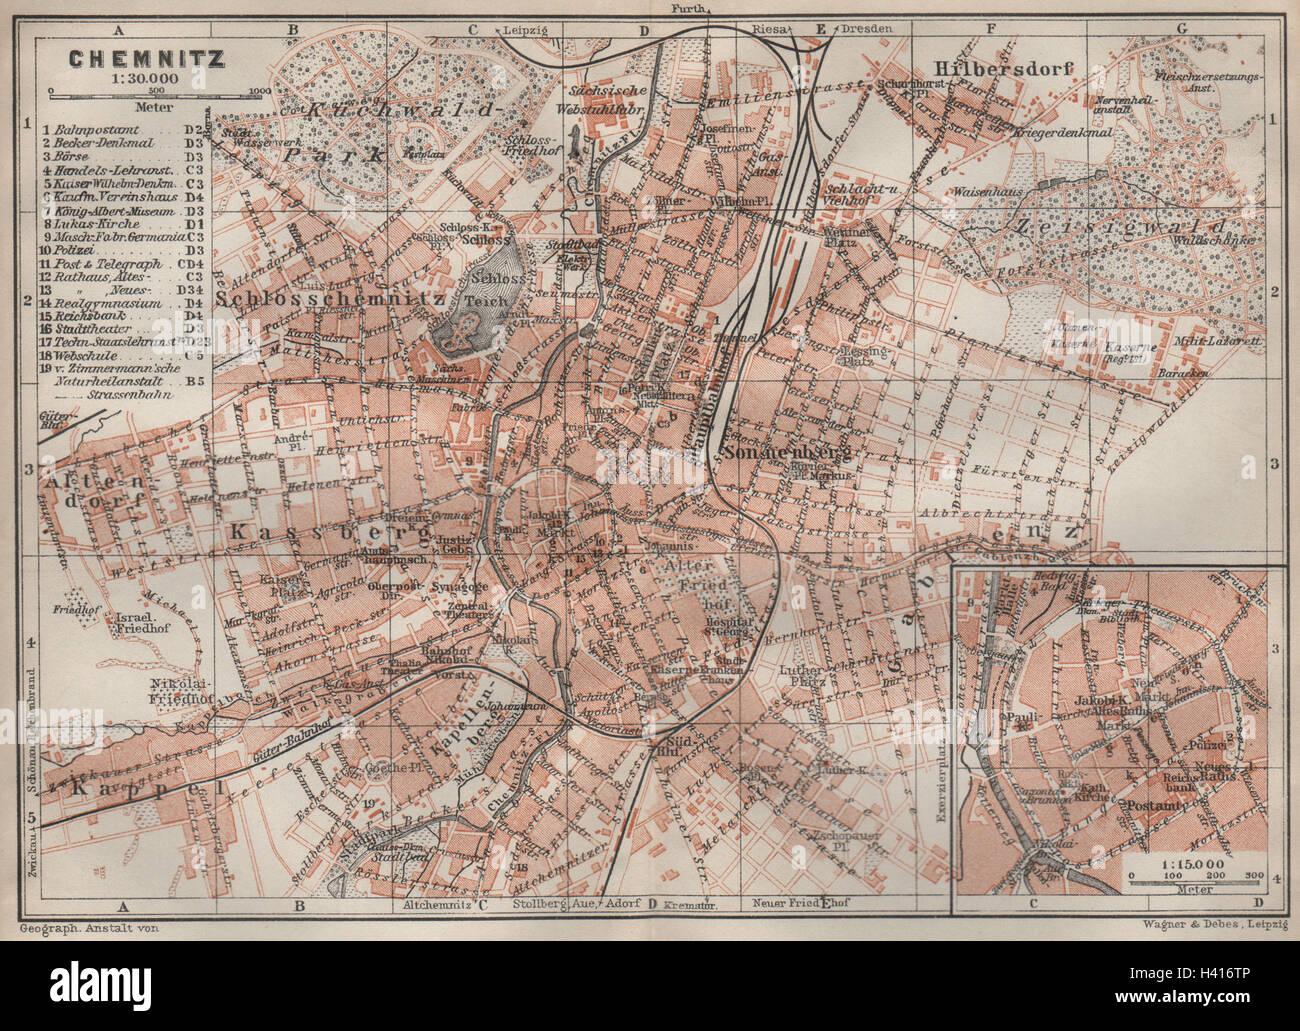 Chemnitz Karte.Chemnitz Antique Town City Stadtplan Saxony Karte Baedeker